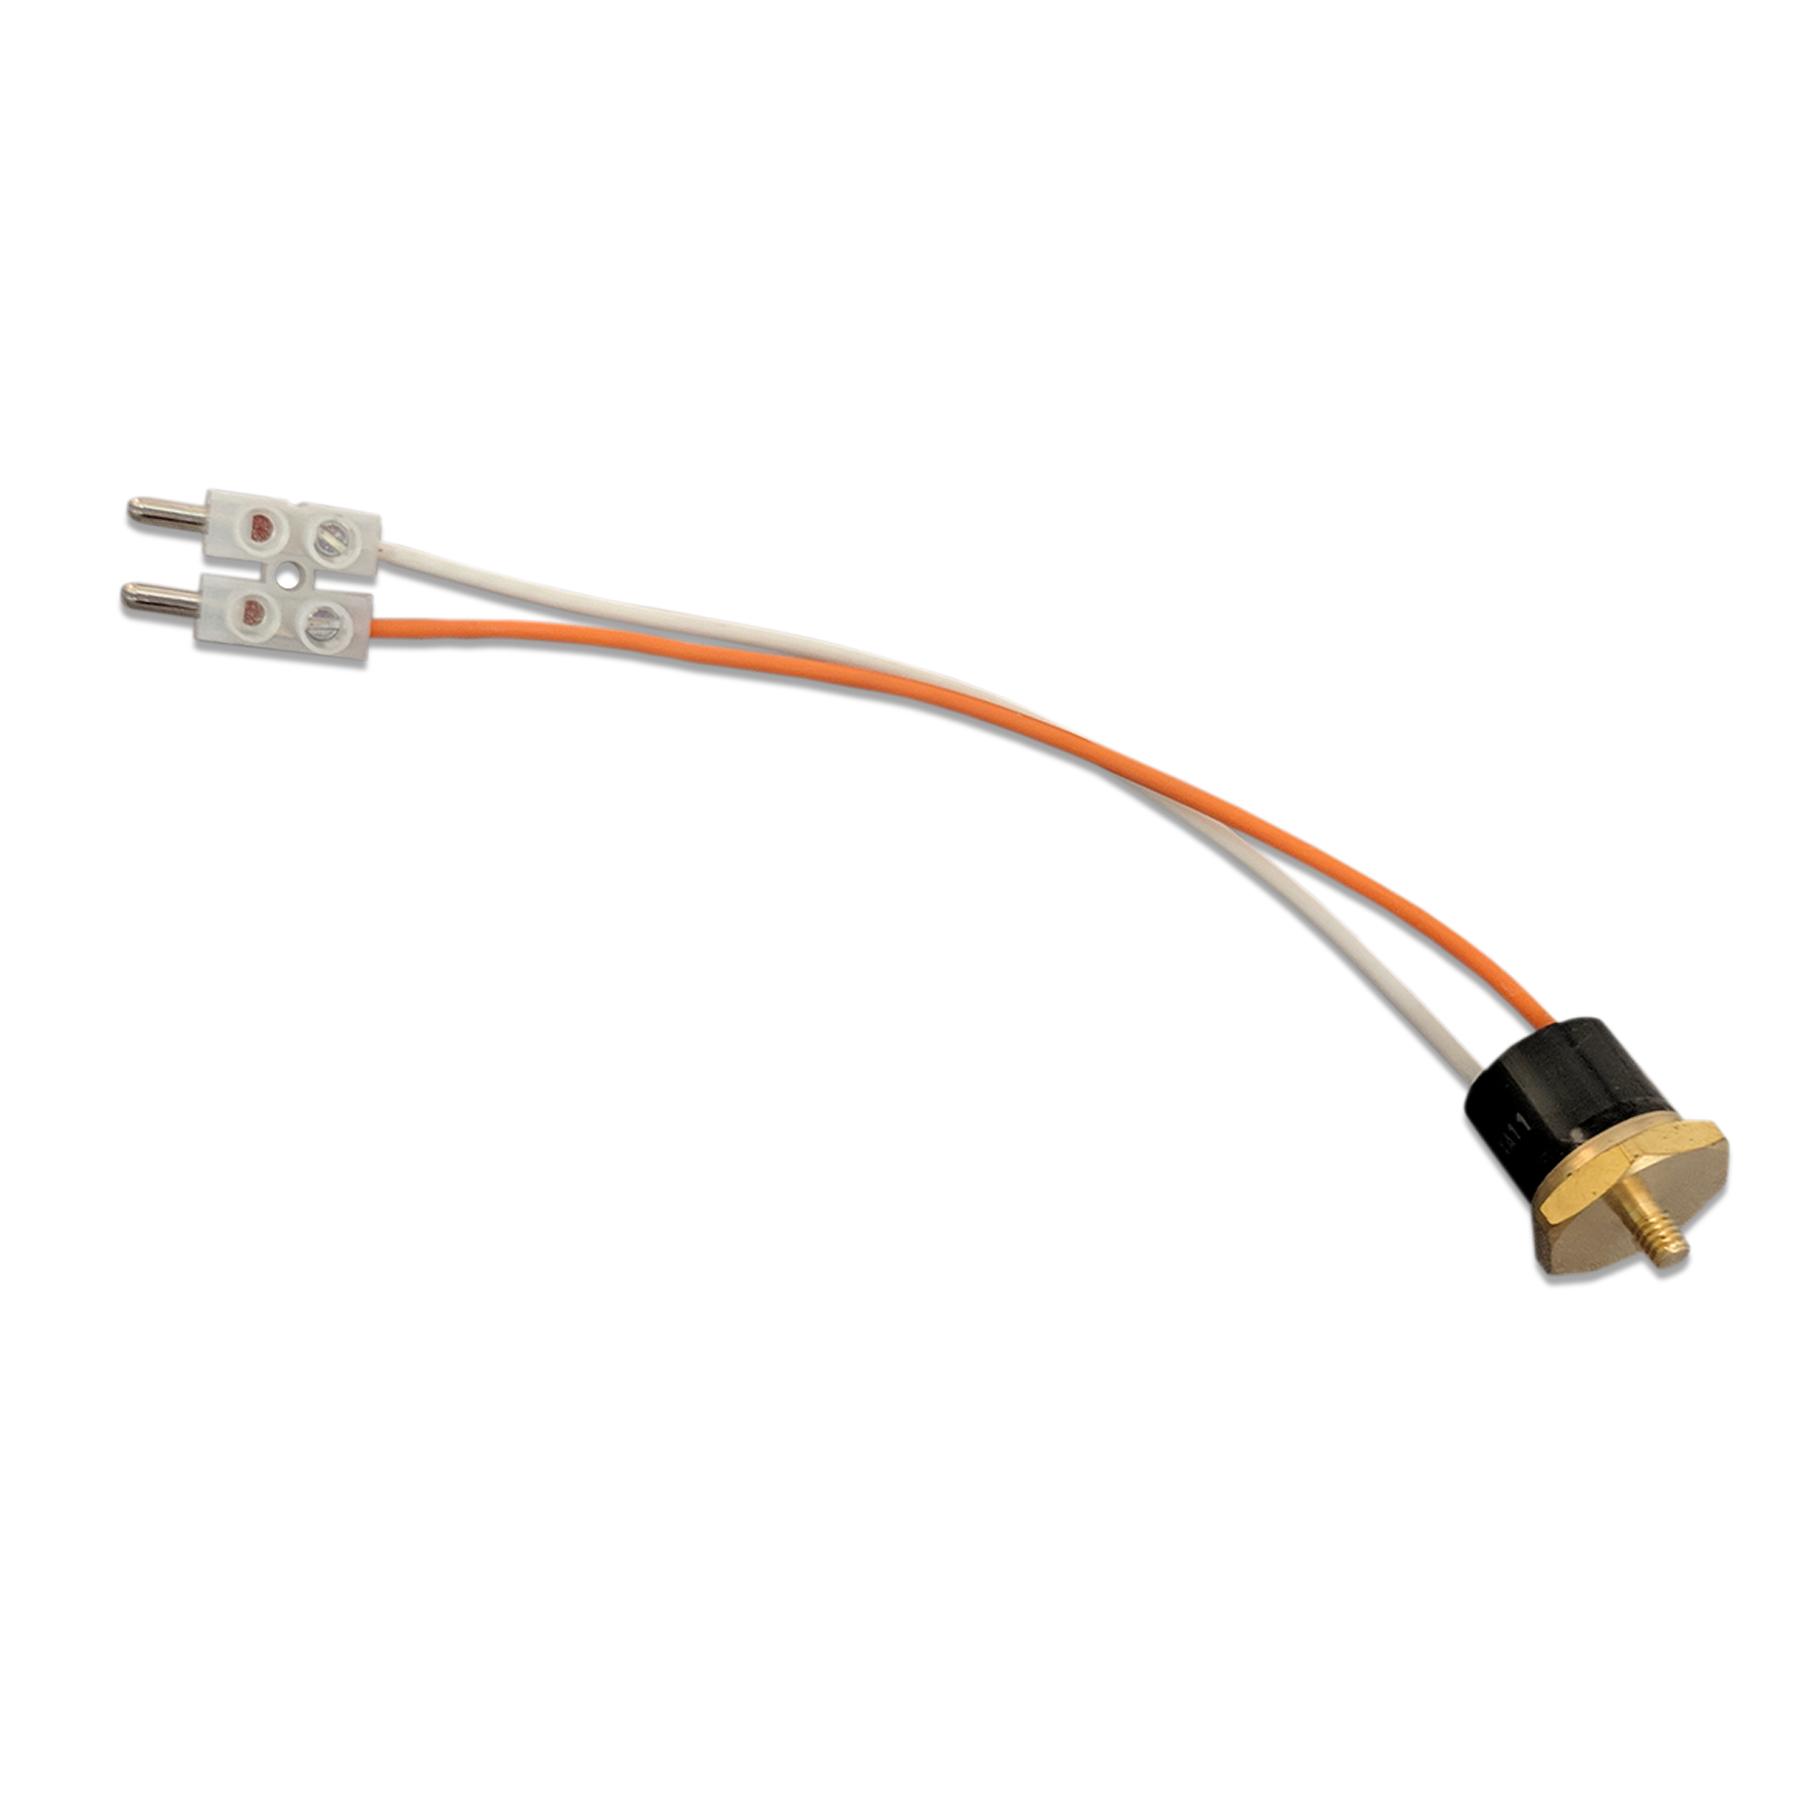 158 Degree F Control Thermostat w/Orange & White Wires